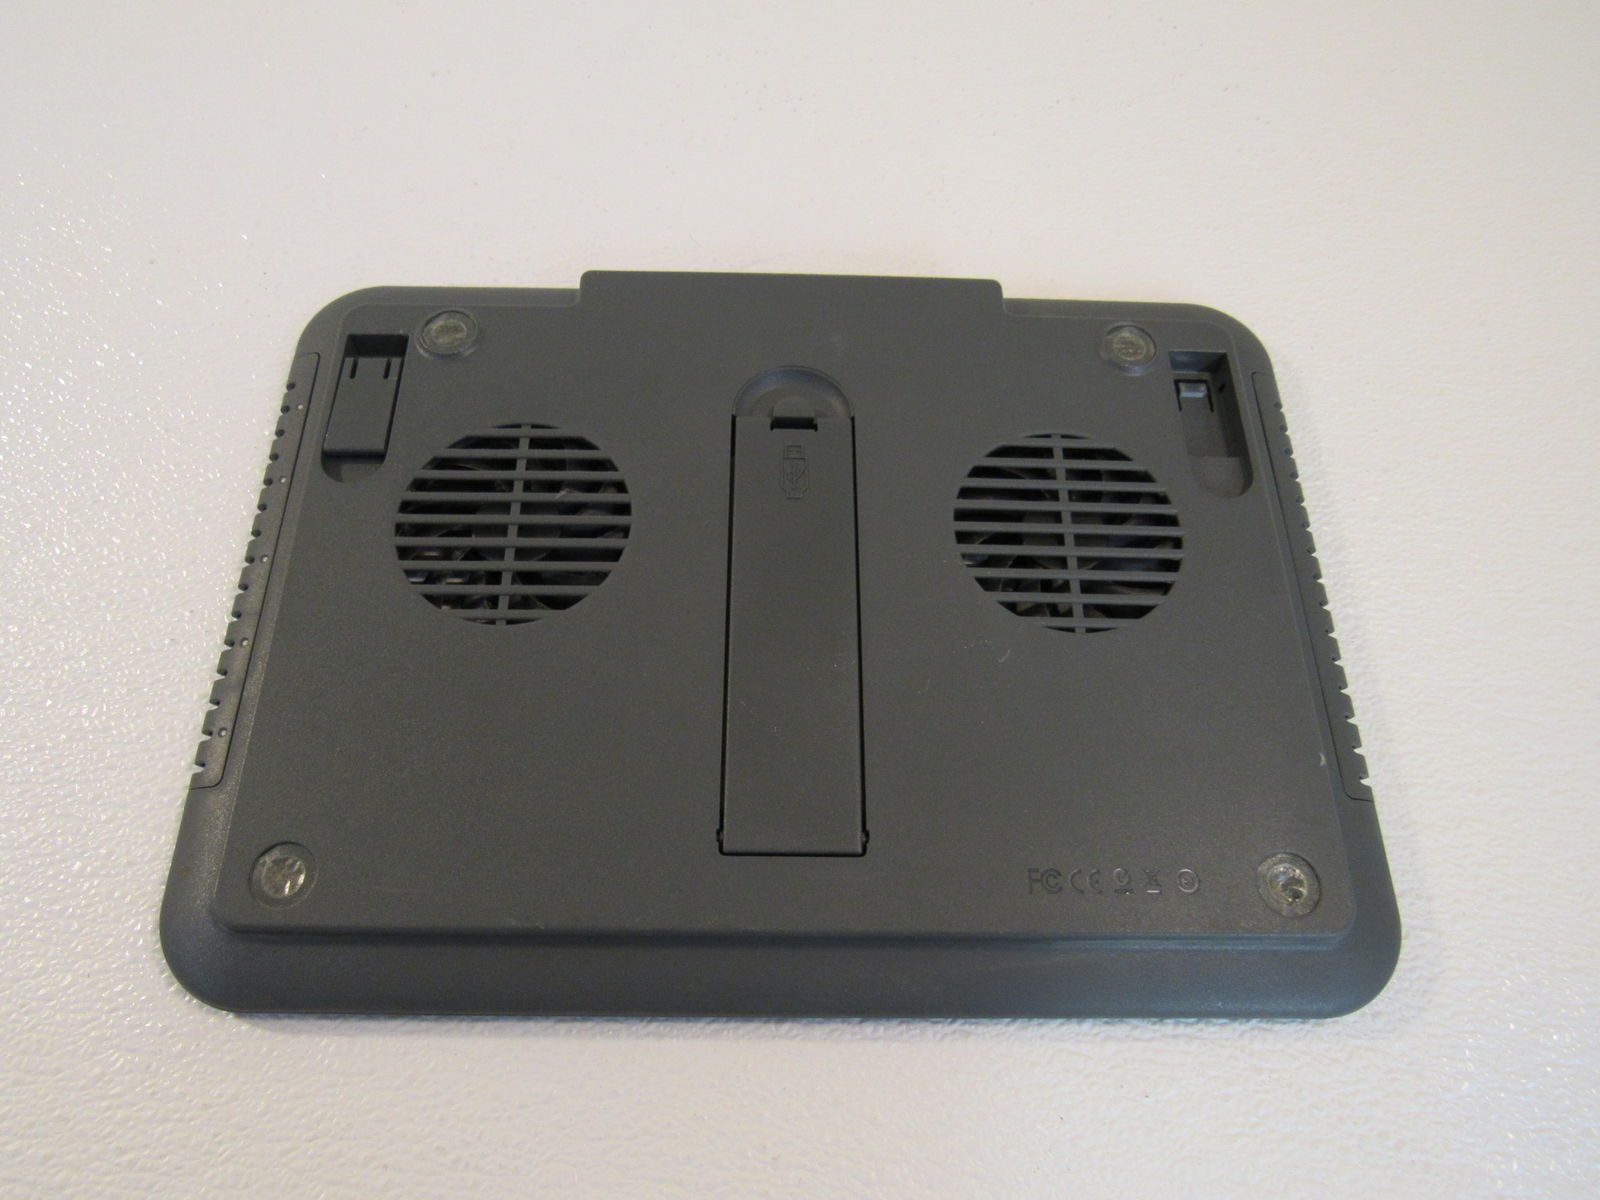 Targus Laptop Cooling Station Chill Hub Charcoal AWE01US1